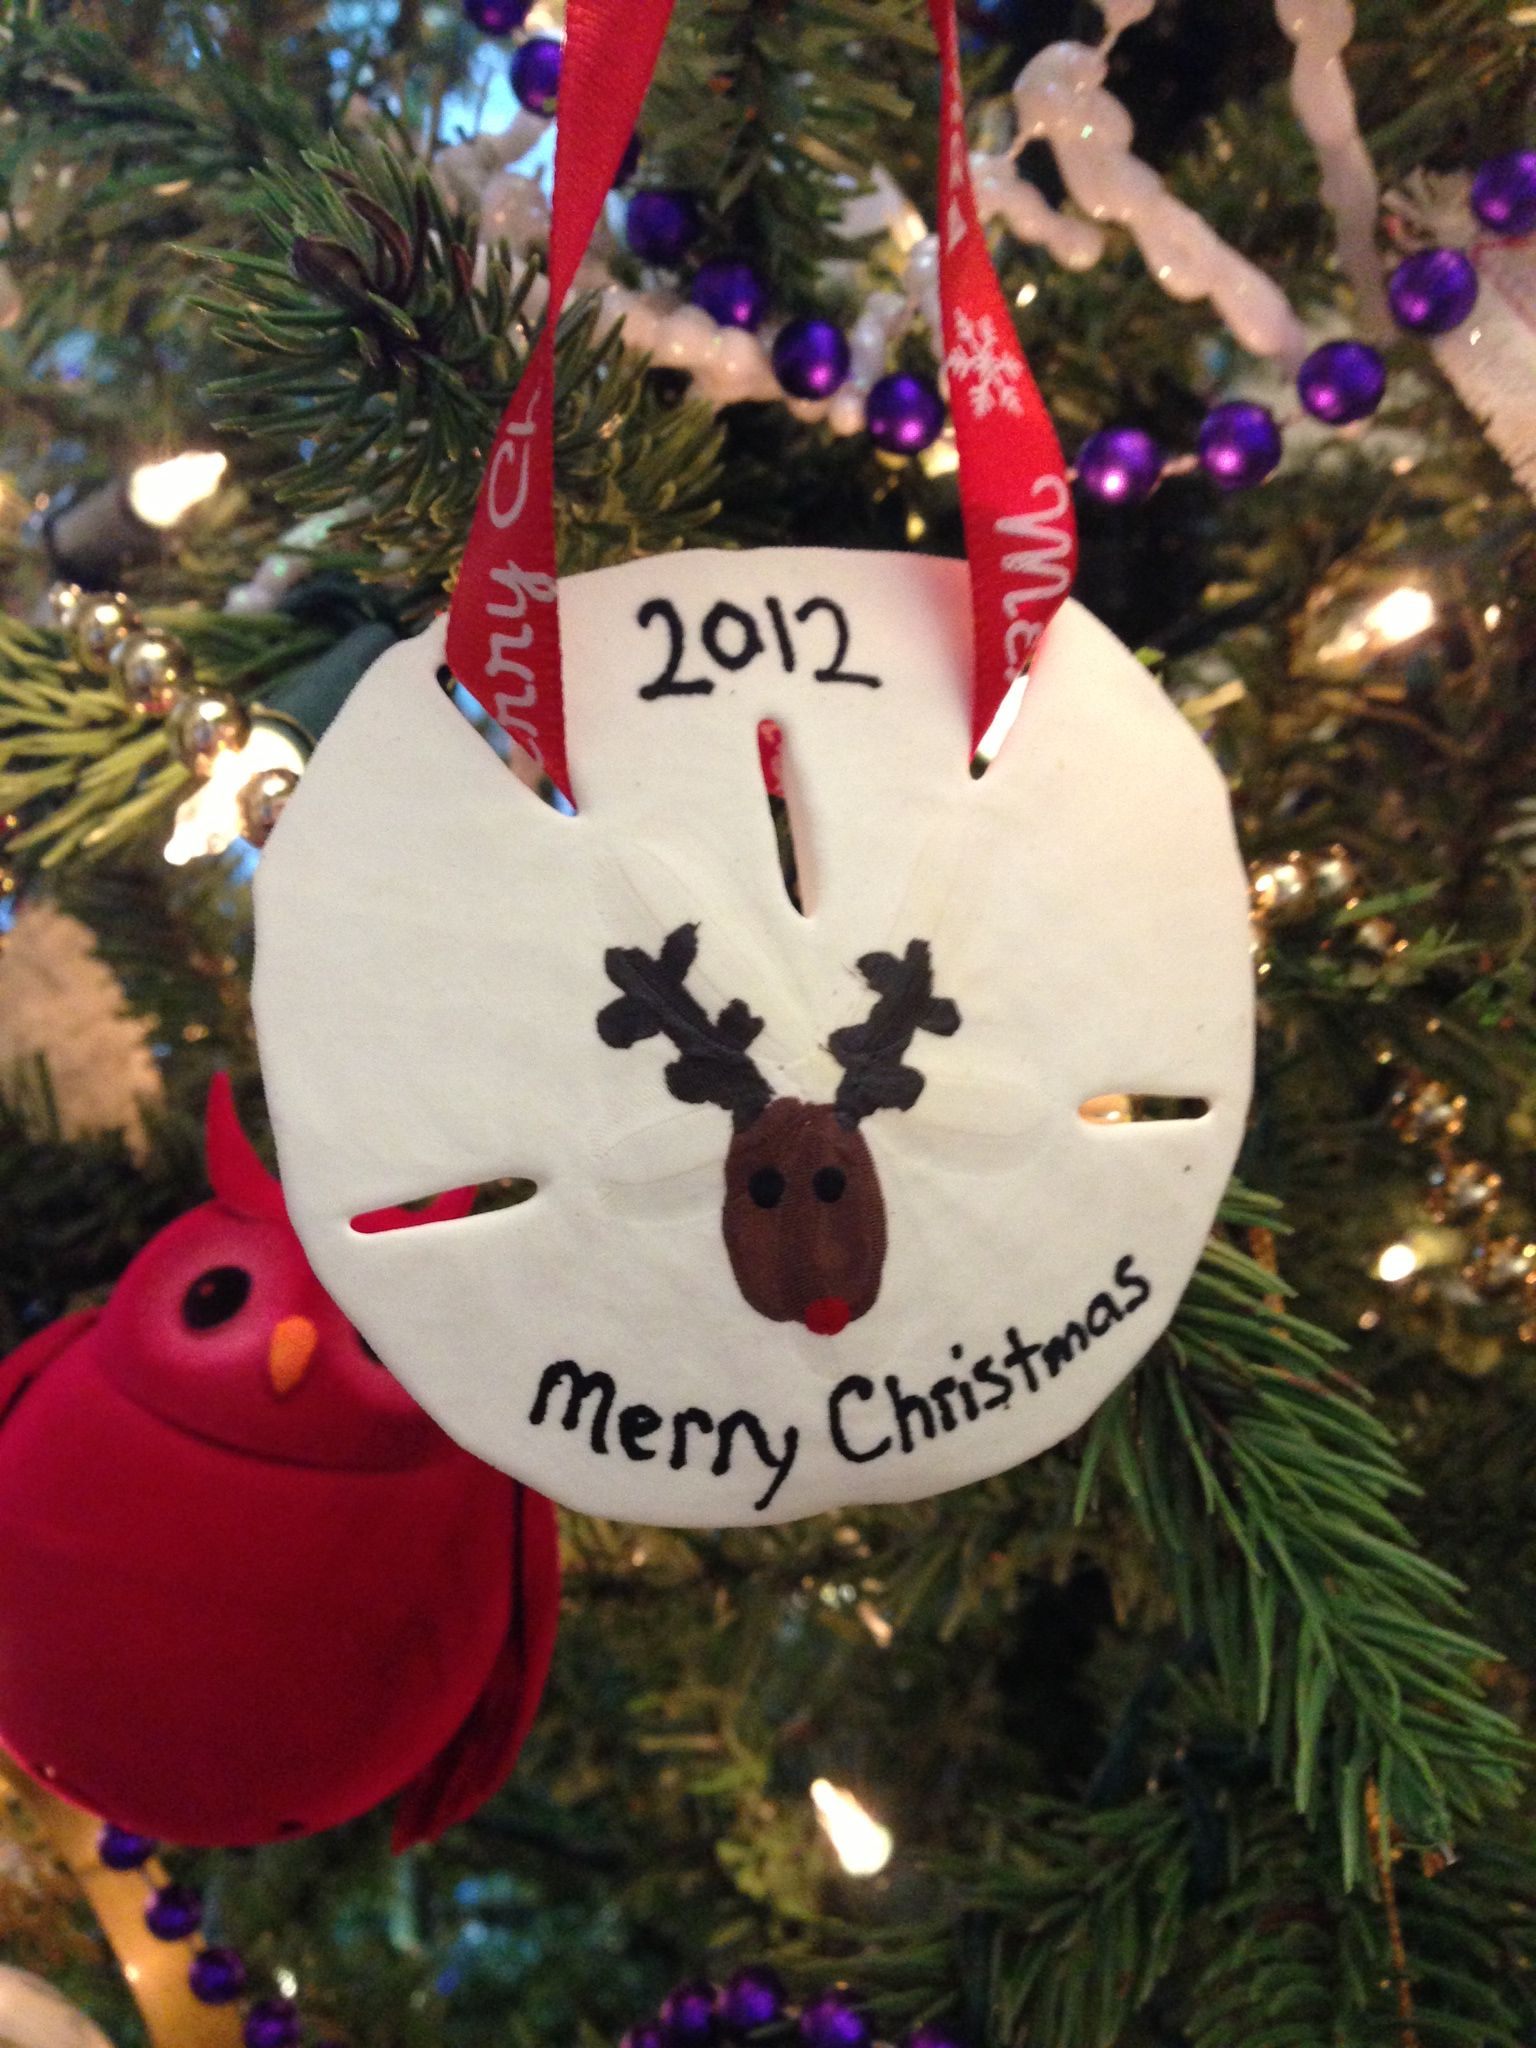 Pin By Amanda Bock On Crafts I Love Sand Dollar Ornament Diy Christmas Ornaments Christmas Ornaments To Make